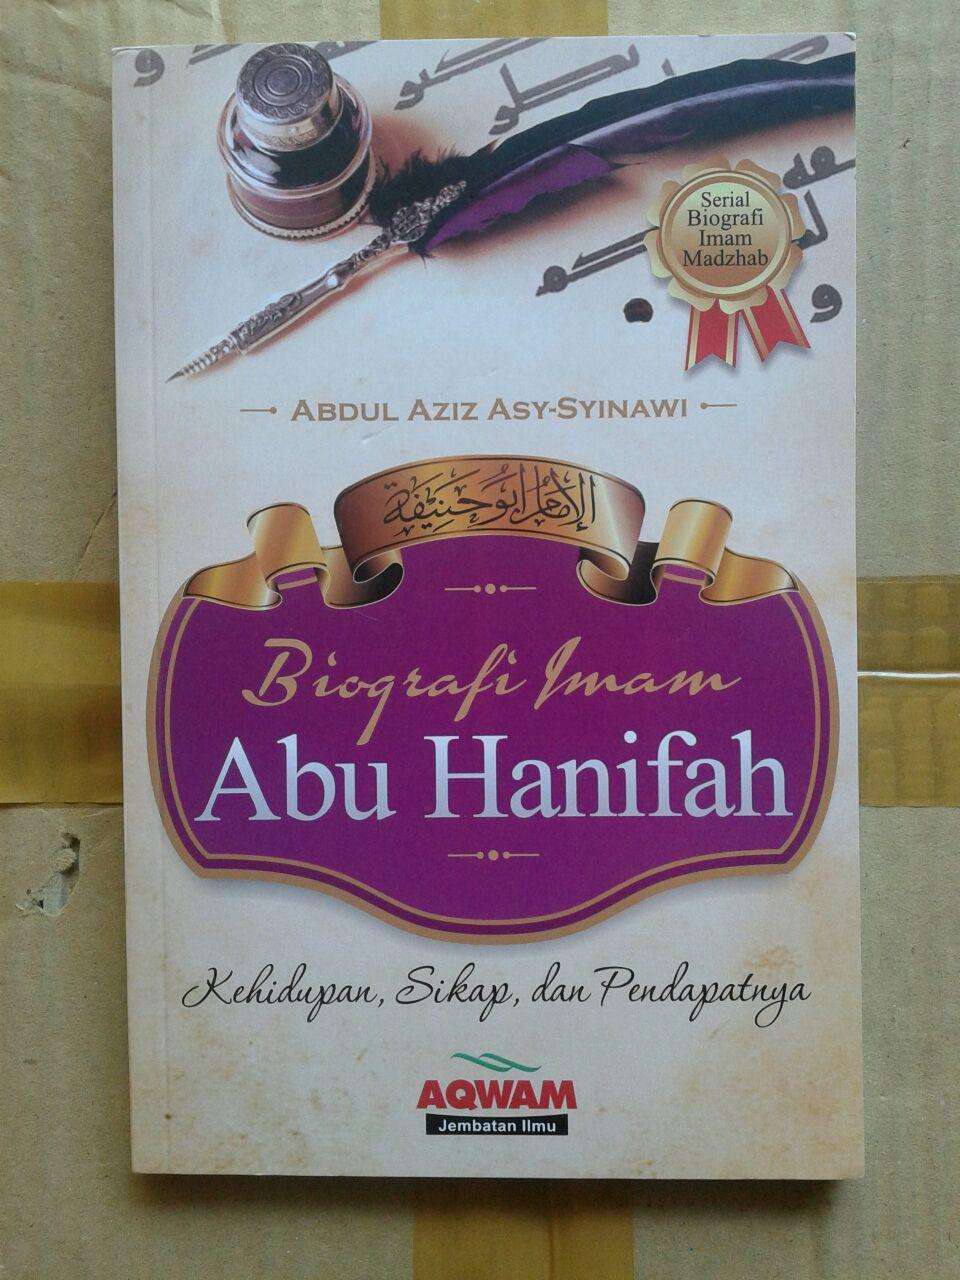 Buku Biografi Imam Abu Hanifah cover